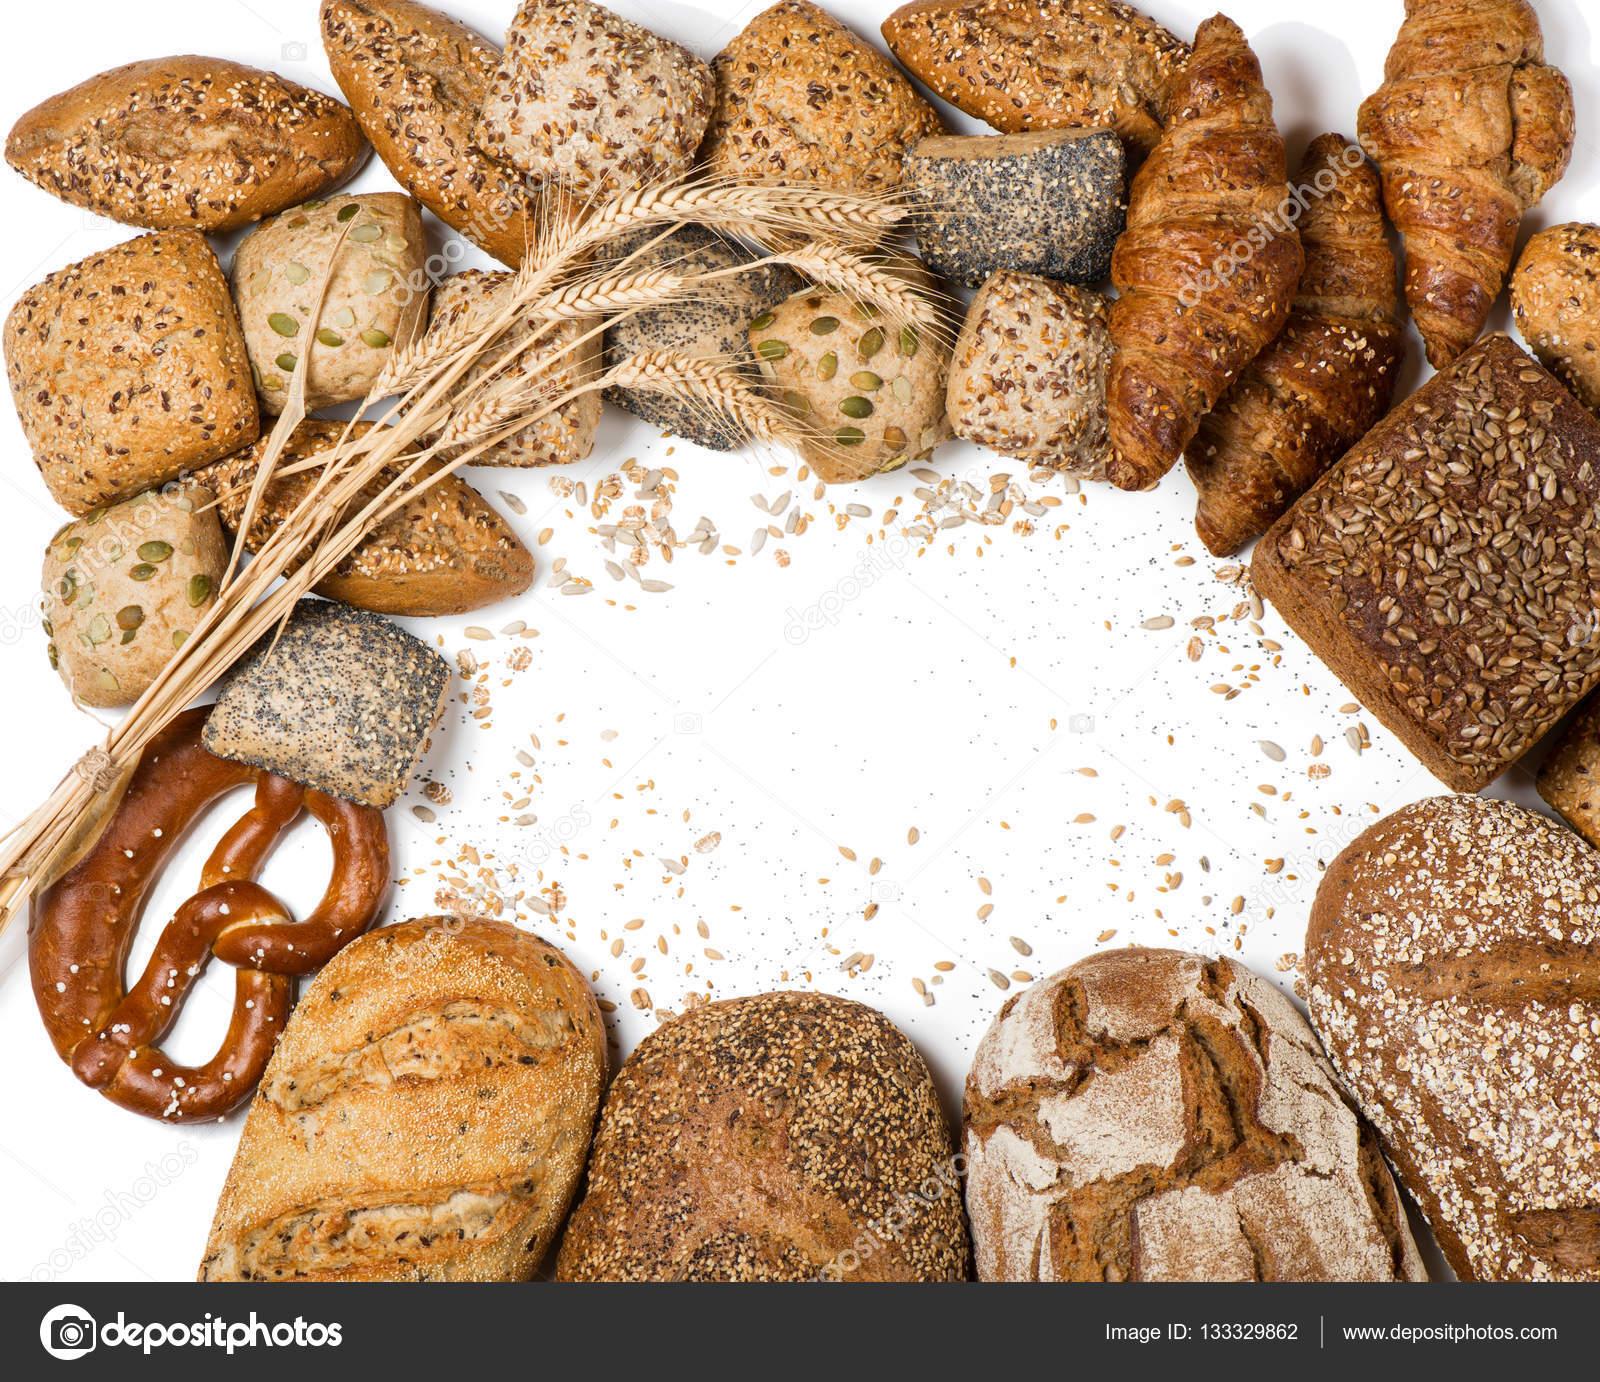 Cornice di vari tipi di pane e panini sopra la vista foto stock denira 133329862 - Diversi tipi di pane ...